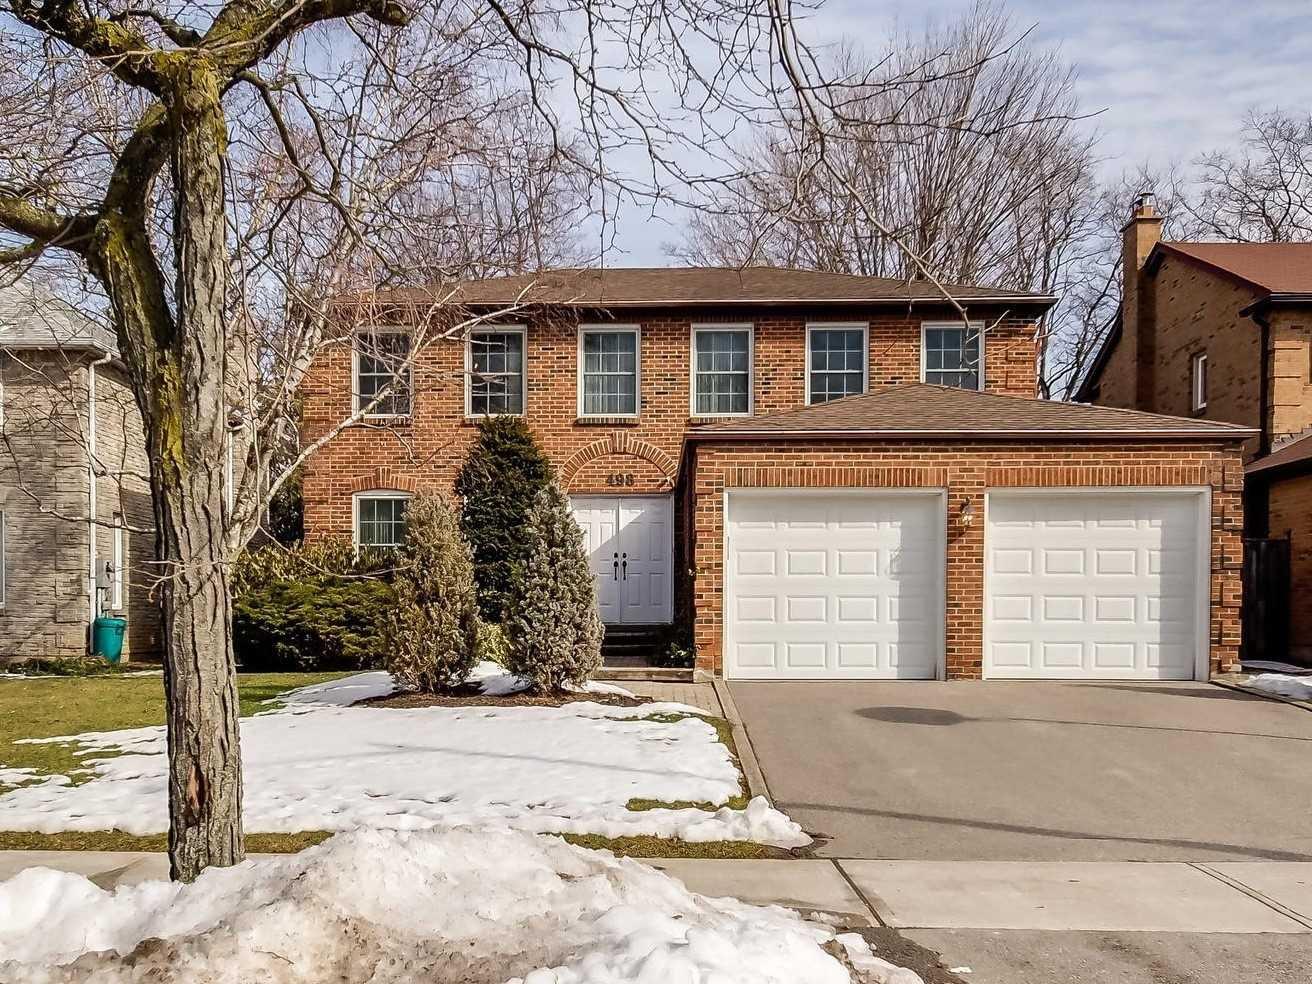 Main Photo: 498 Hidden Trail in Toronto: Westminster-Branson House (2-Storey) for sale (Toronto C07)  : MLS®# C4709173